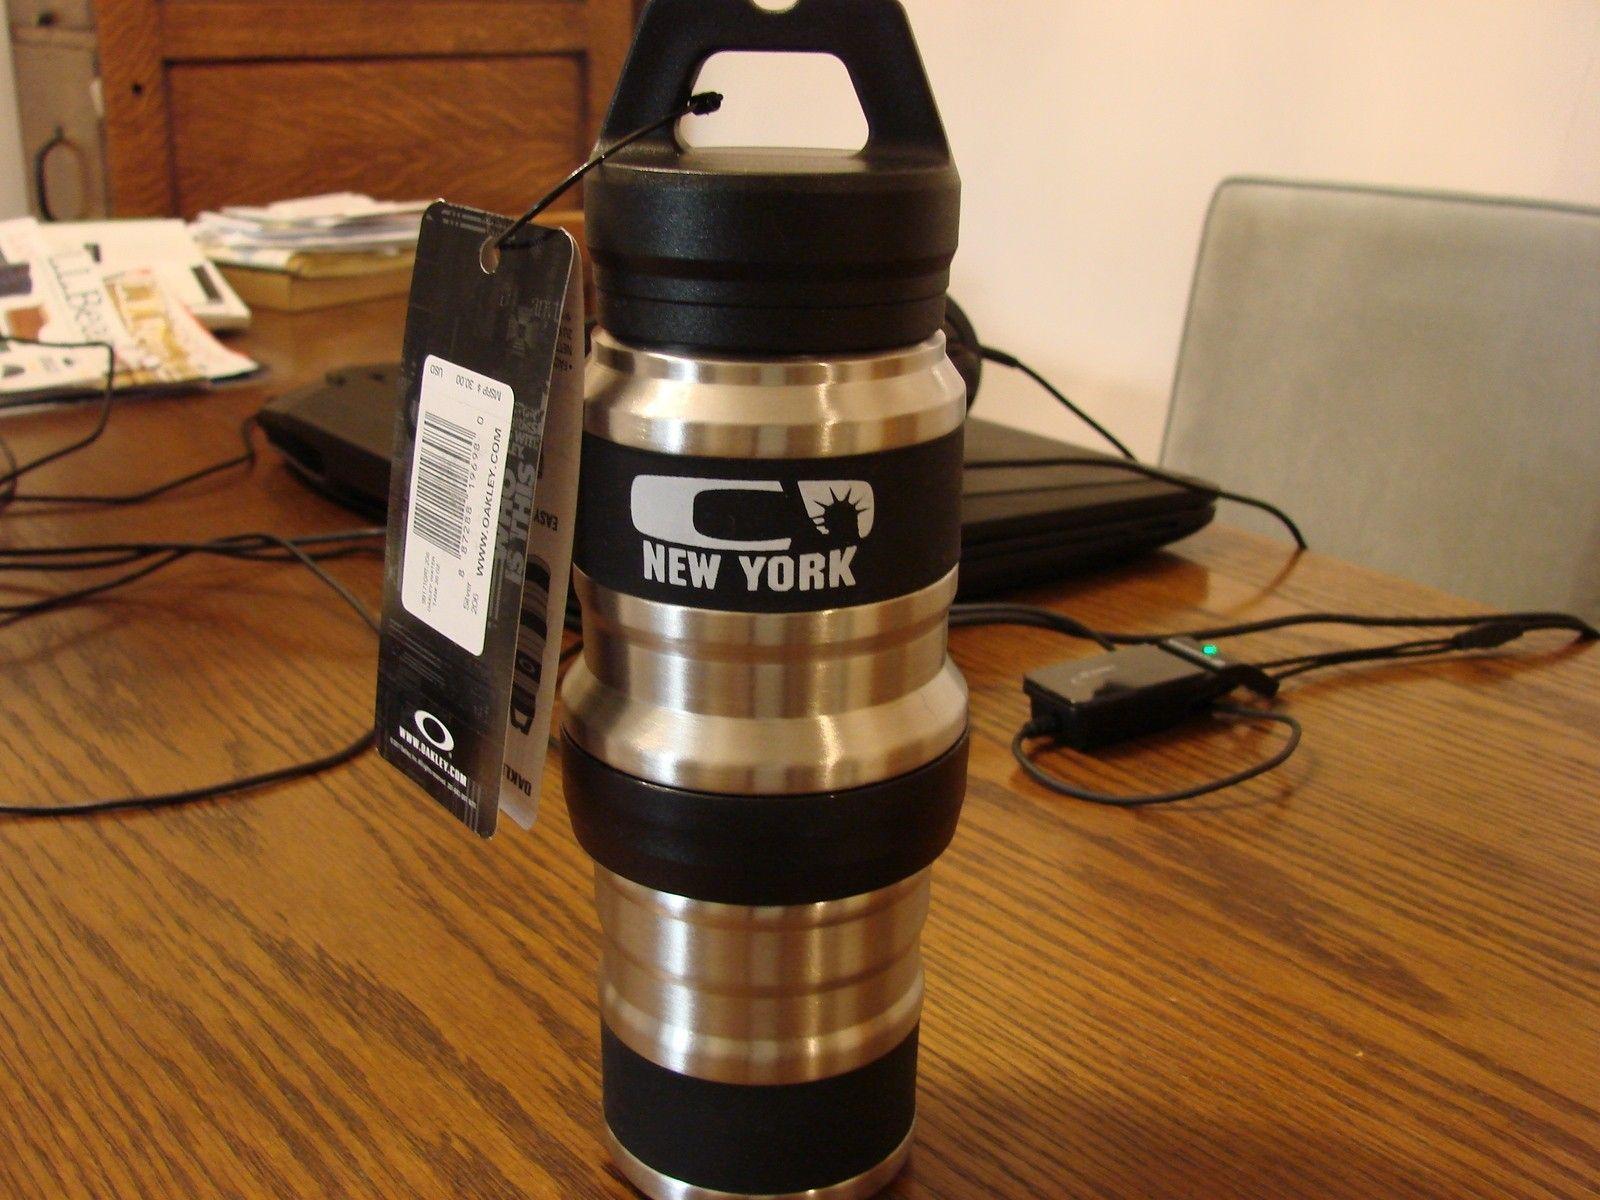 SOLD 20 OZ STAINLESS STEEL NEW YORK CITY WATER TANK - DSC00151.JPG